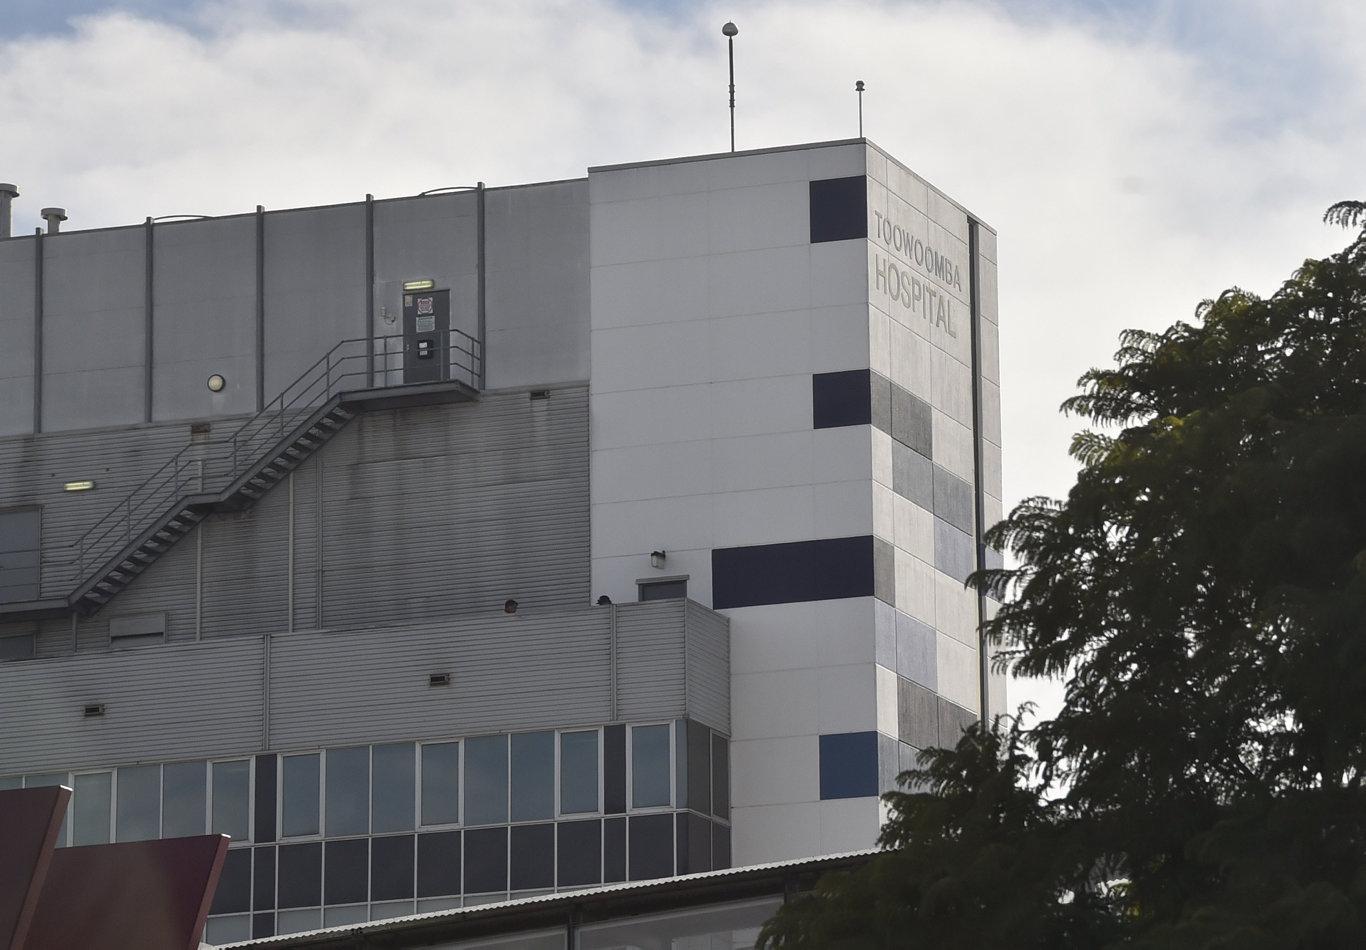 Toowoomba Hospital. July 2019